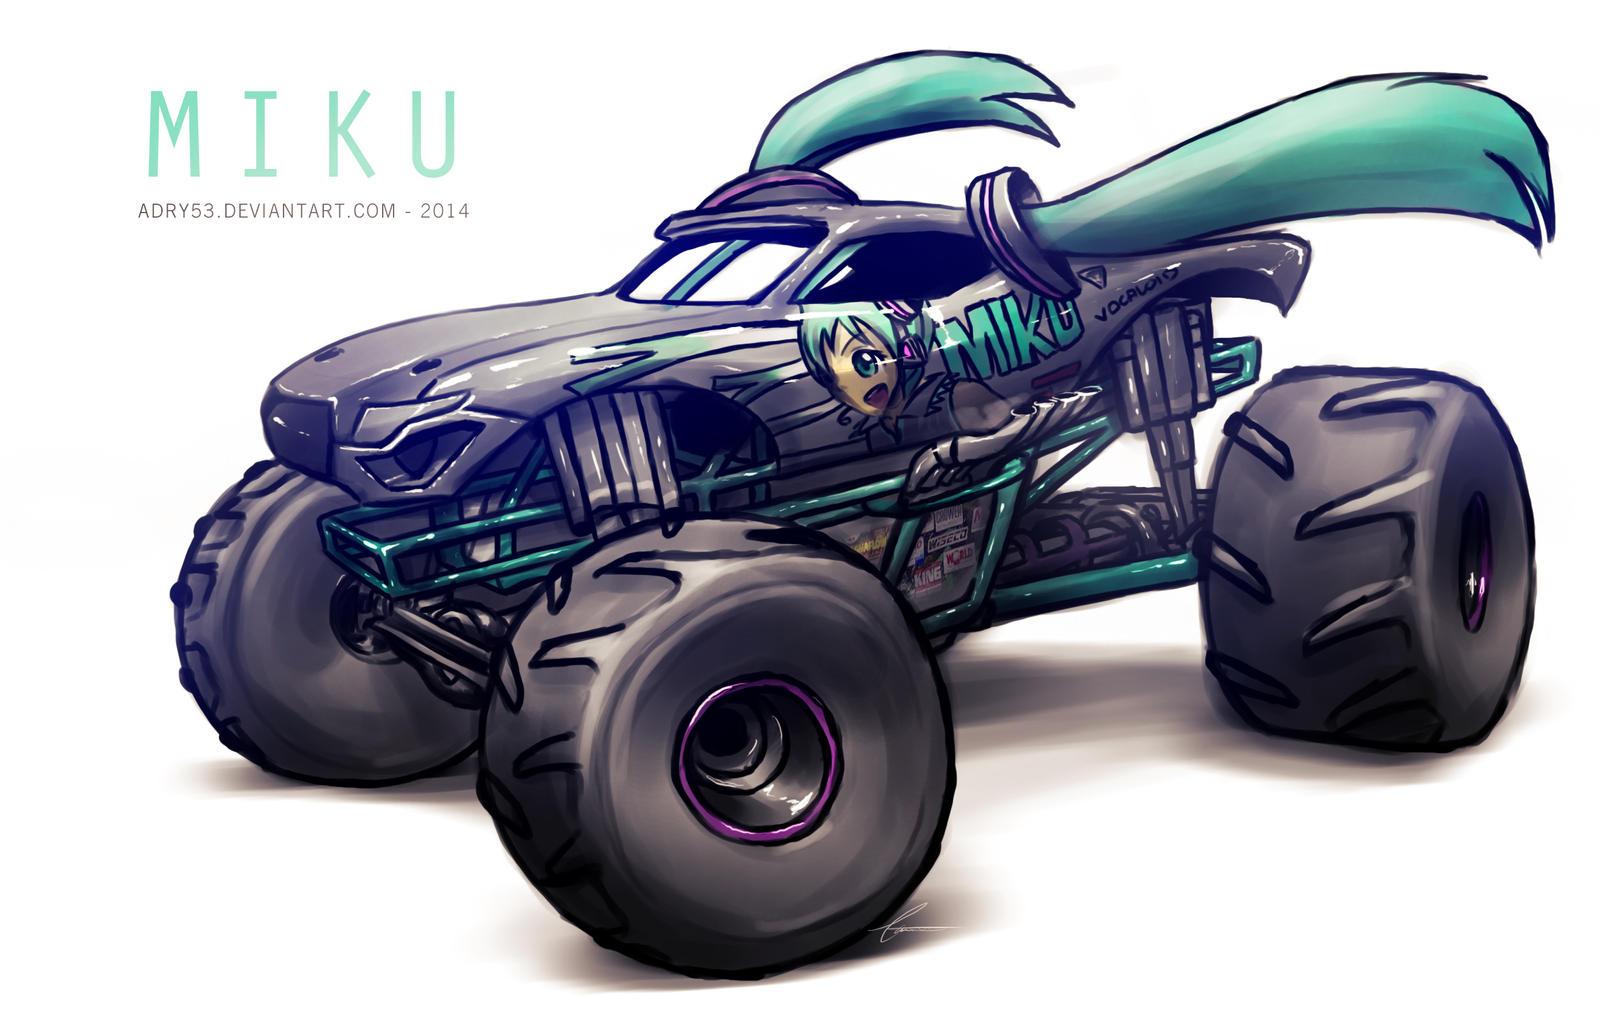 Monster Jam MIKU by Adry53